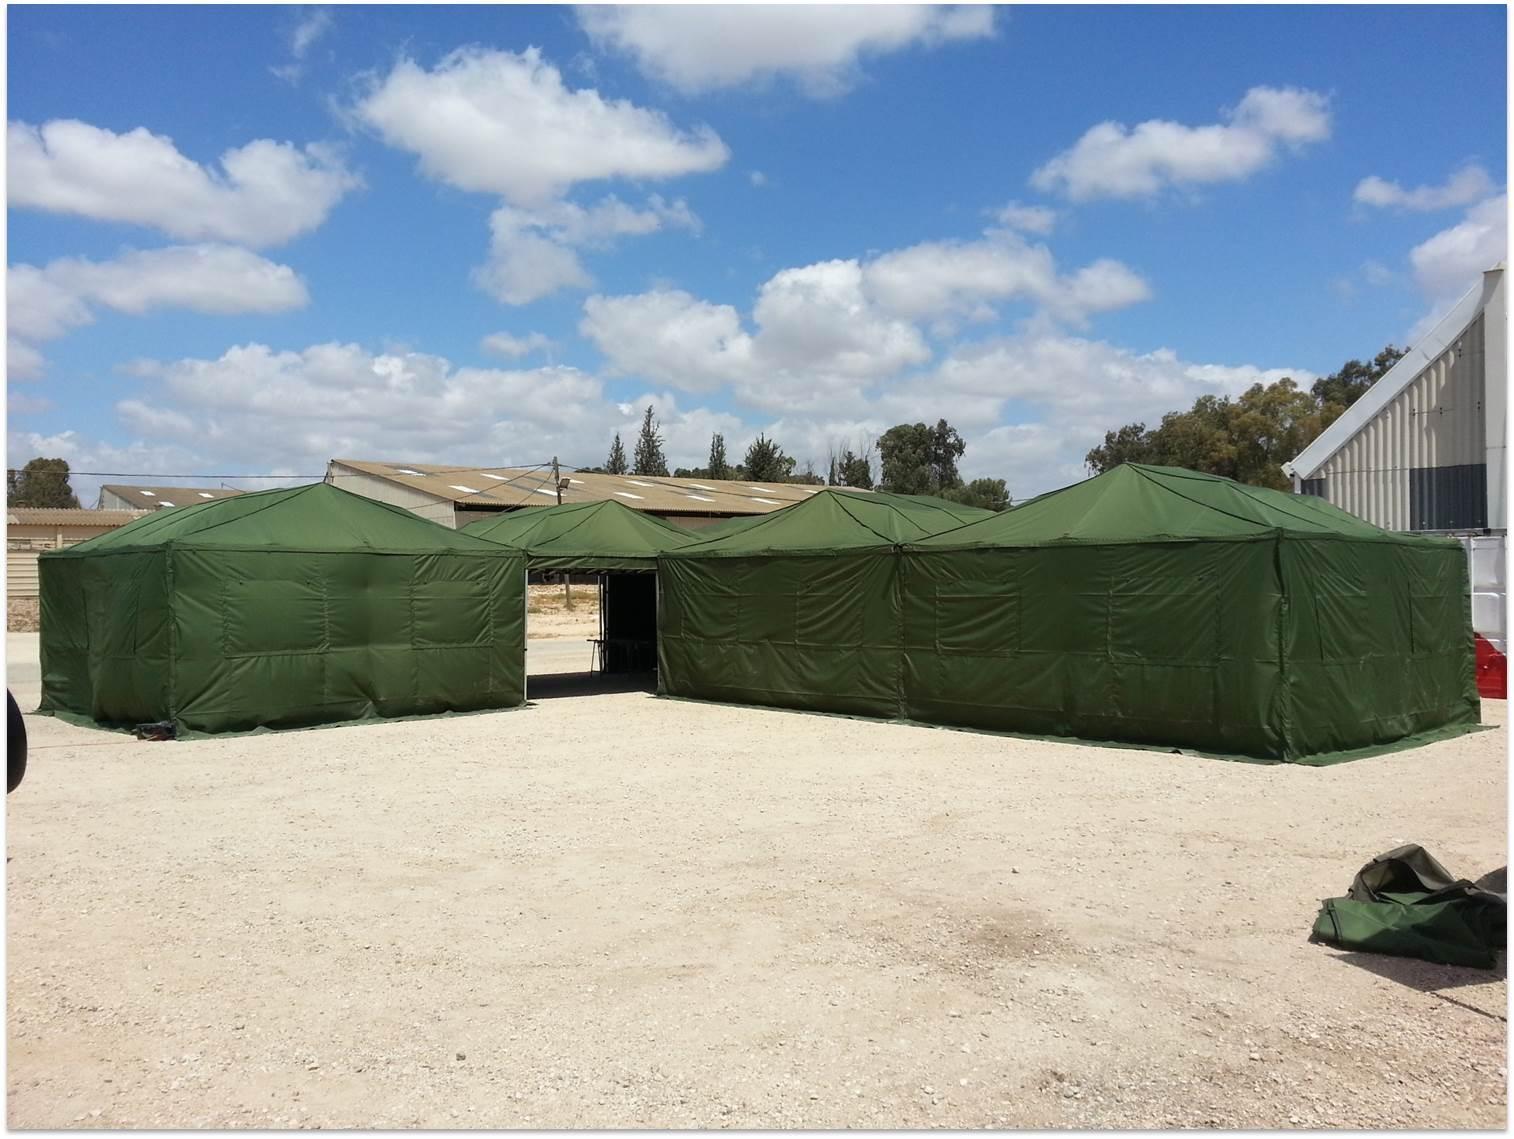 knolltech ltd - Post Command Tents